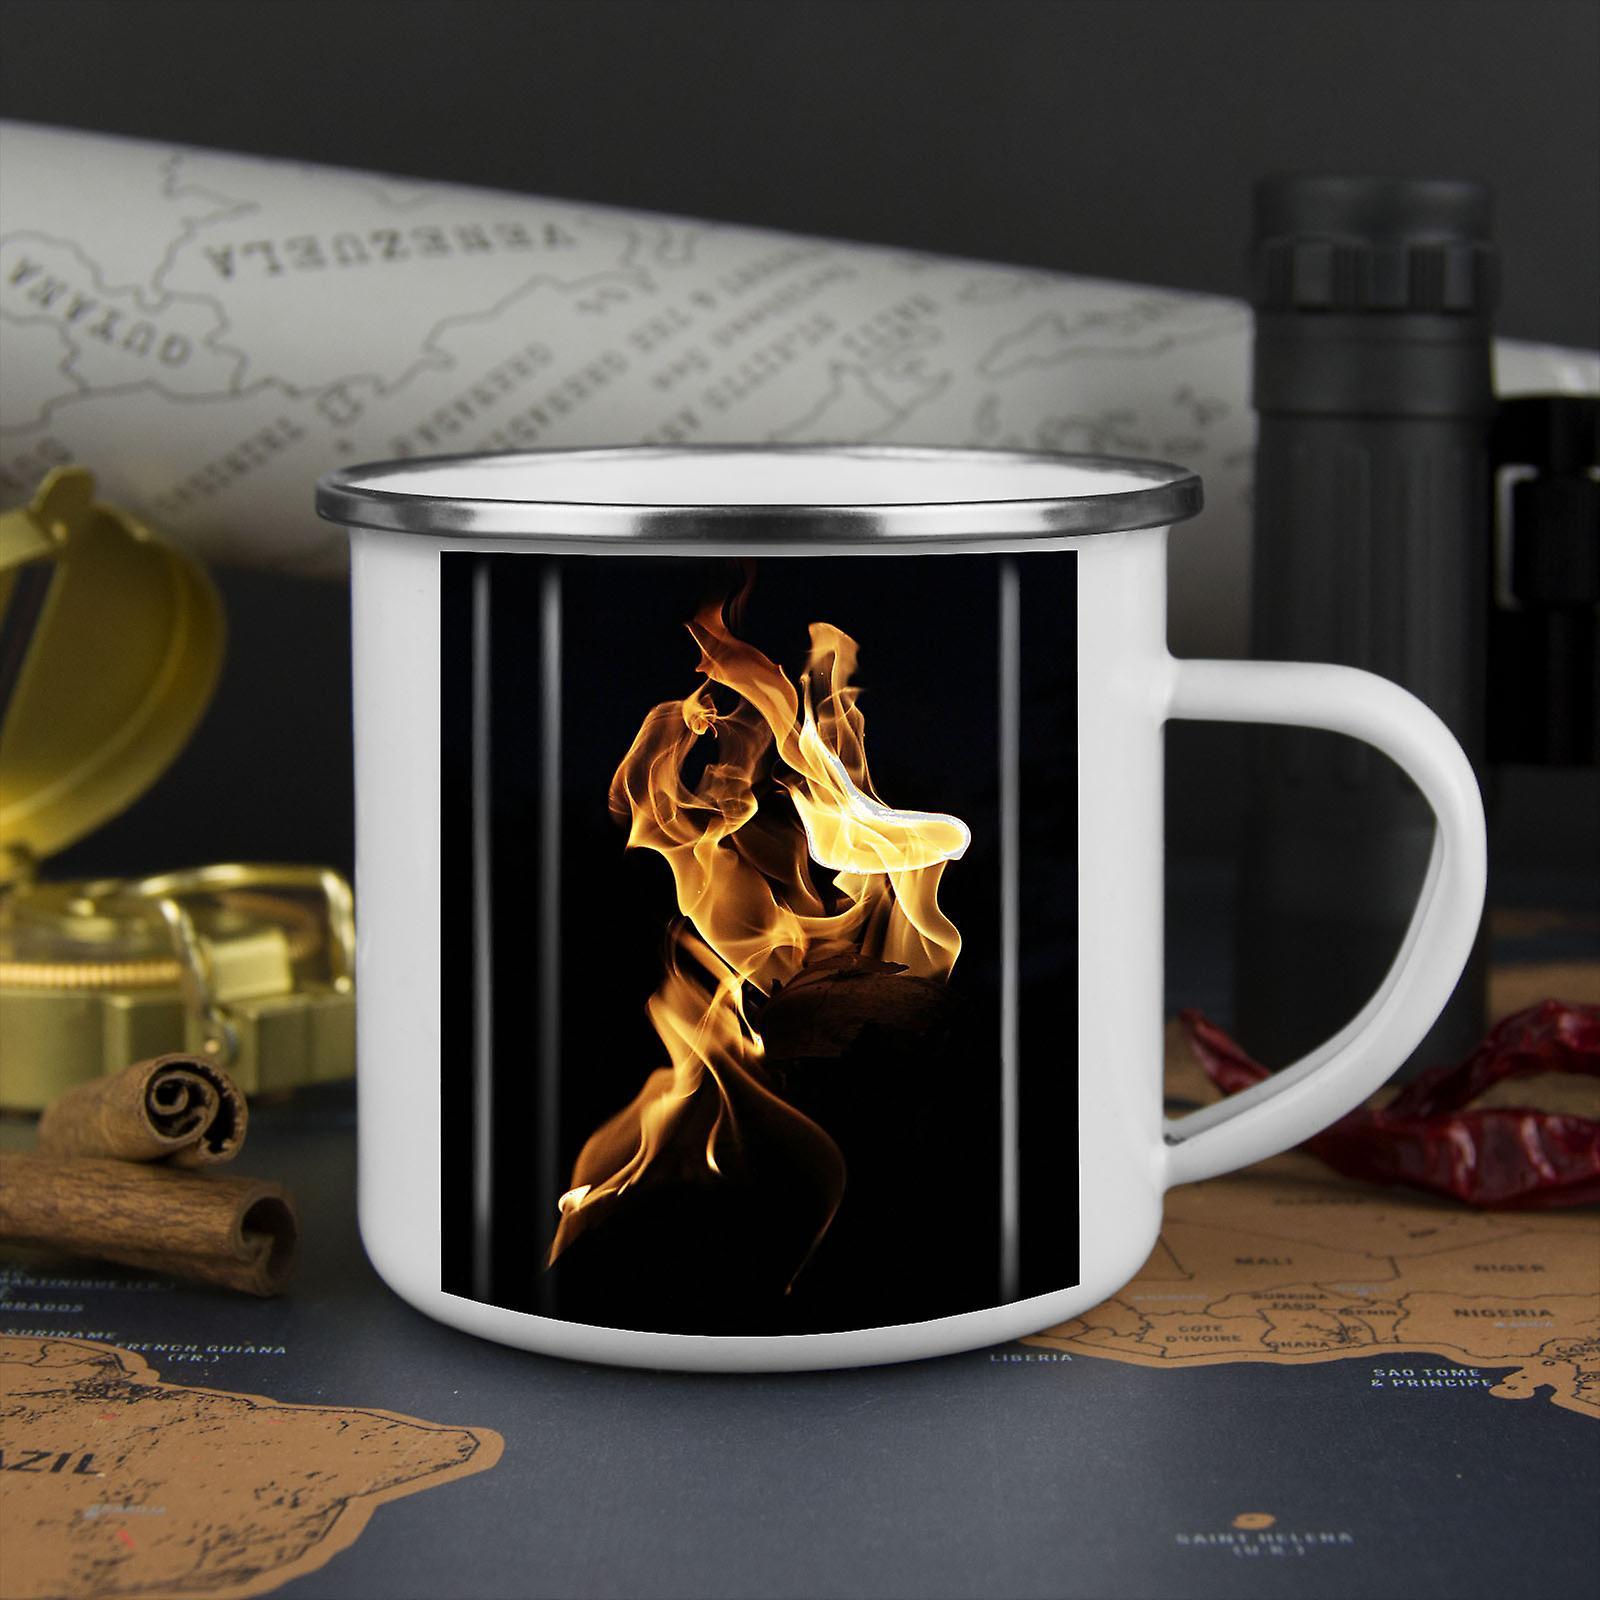 Flamme Feuer heiß Natur neue WhiteTea Kaffee Emaille Mug10 oz | Wellcoda